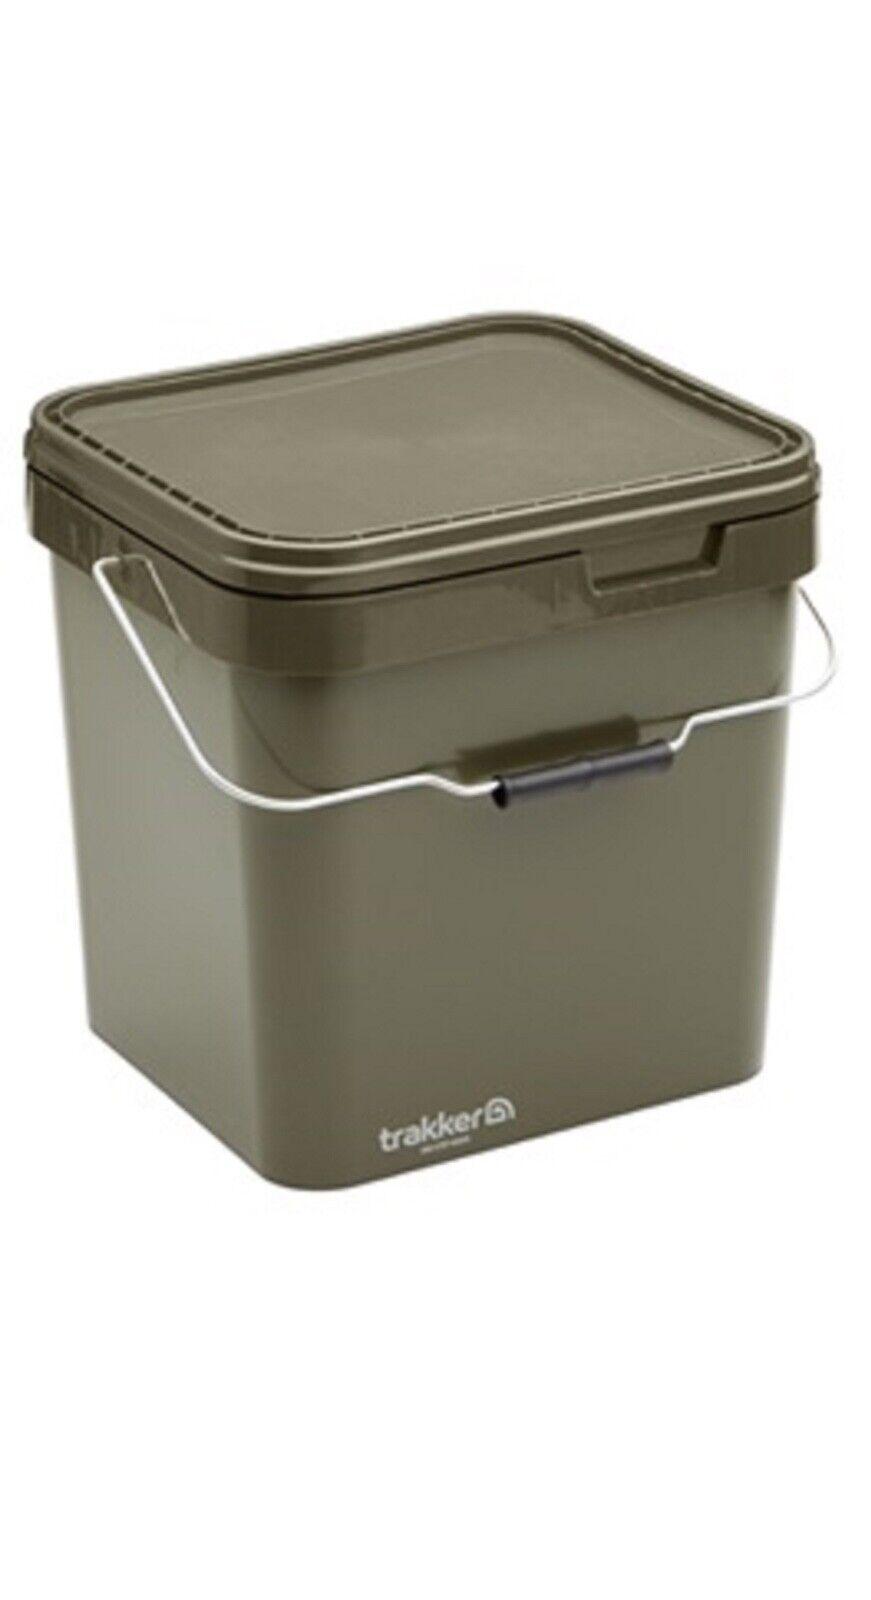 Trakker Behälter 17/13/5Liter Angeleimer Pureflo Bait Filter Air-Dry System